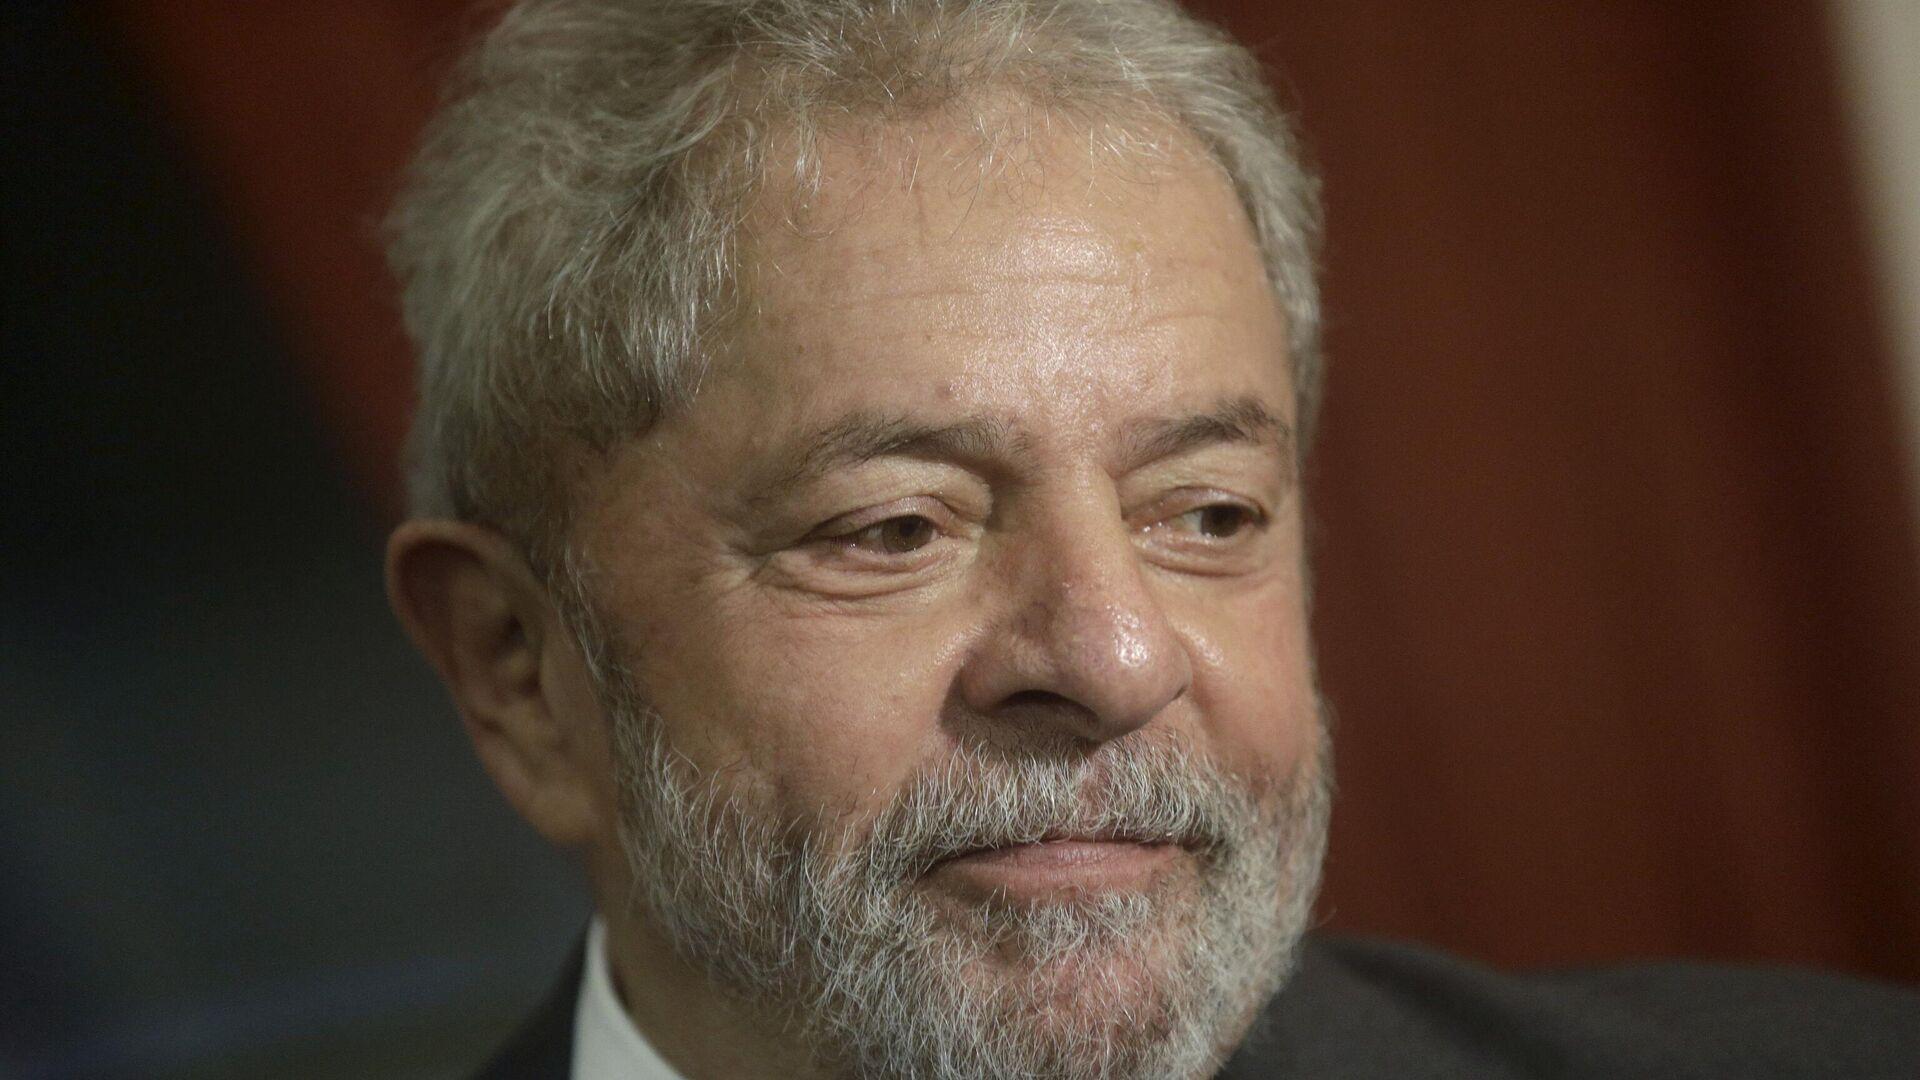 El expresidente brasileño Luiz Inácio Lula da Silva - Sputnik Mundo, 1920, 08.10.2021